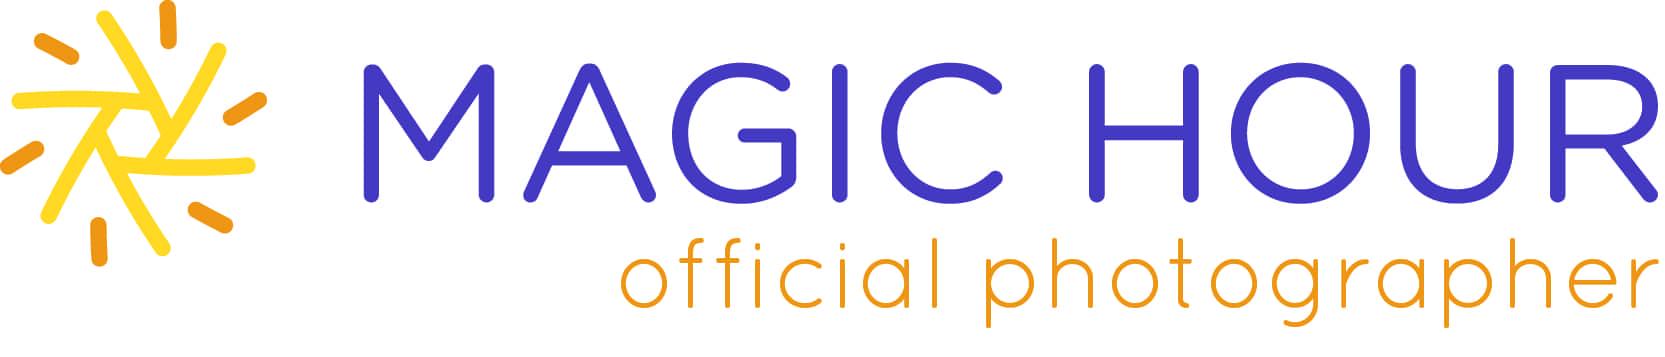 magic-hour-photogrpaher-badge